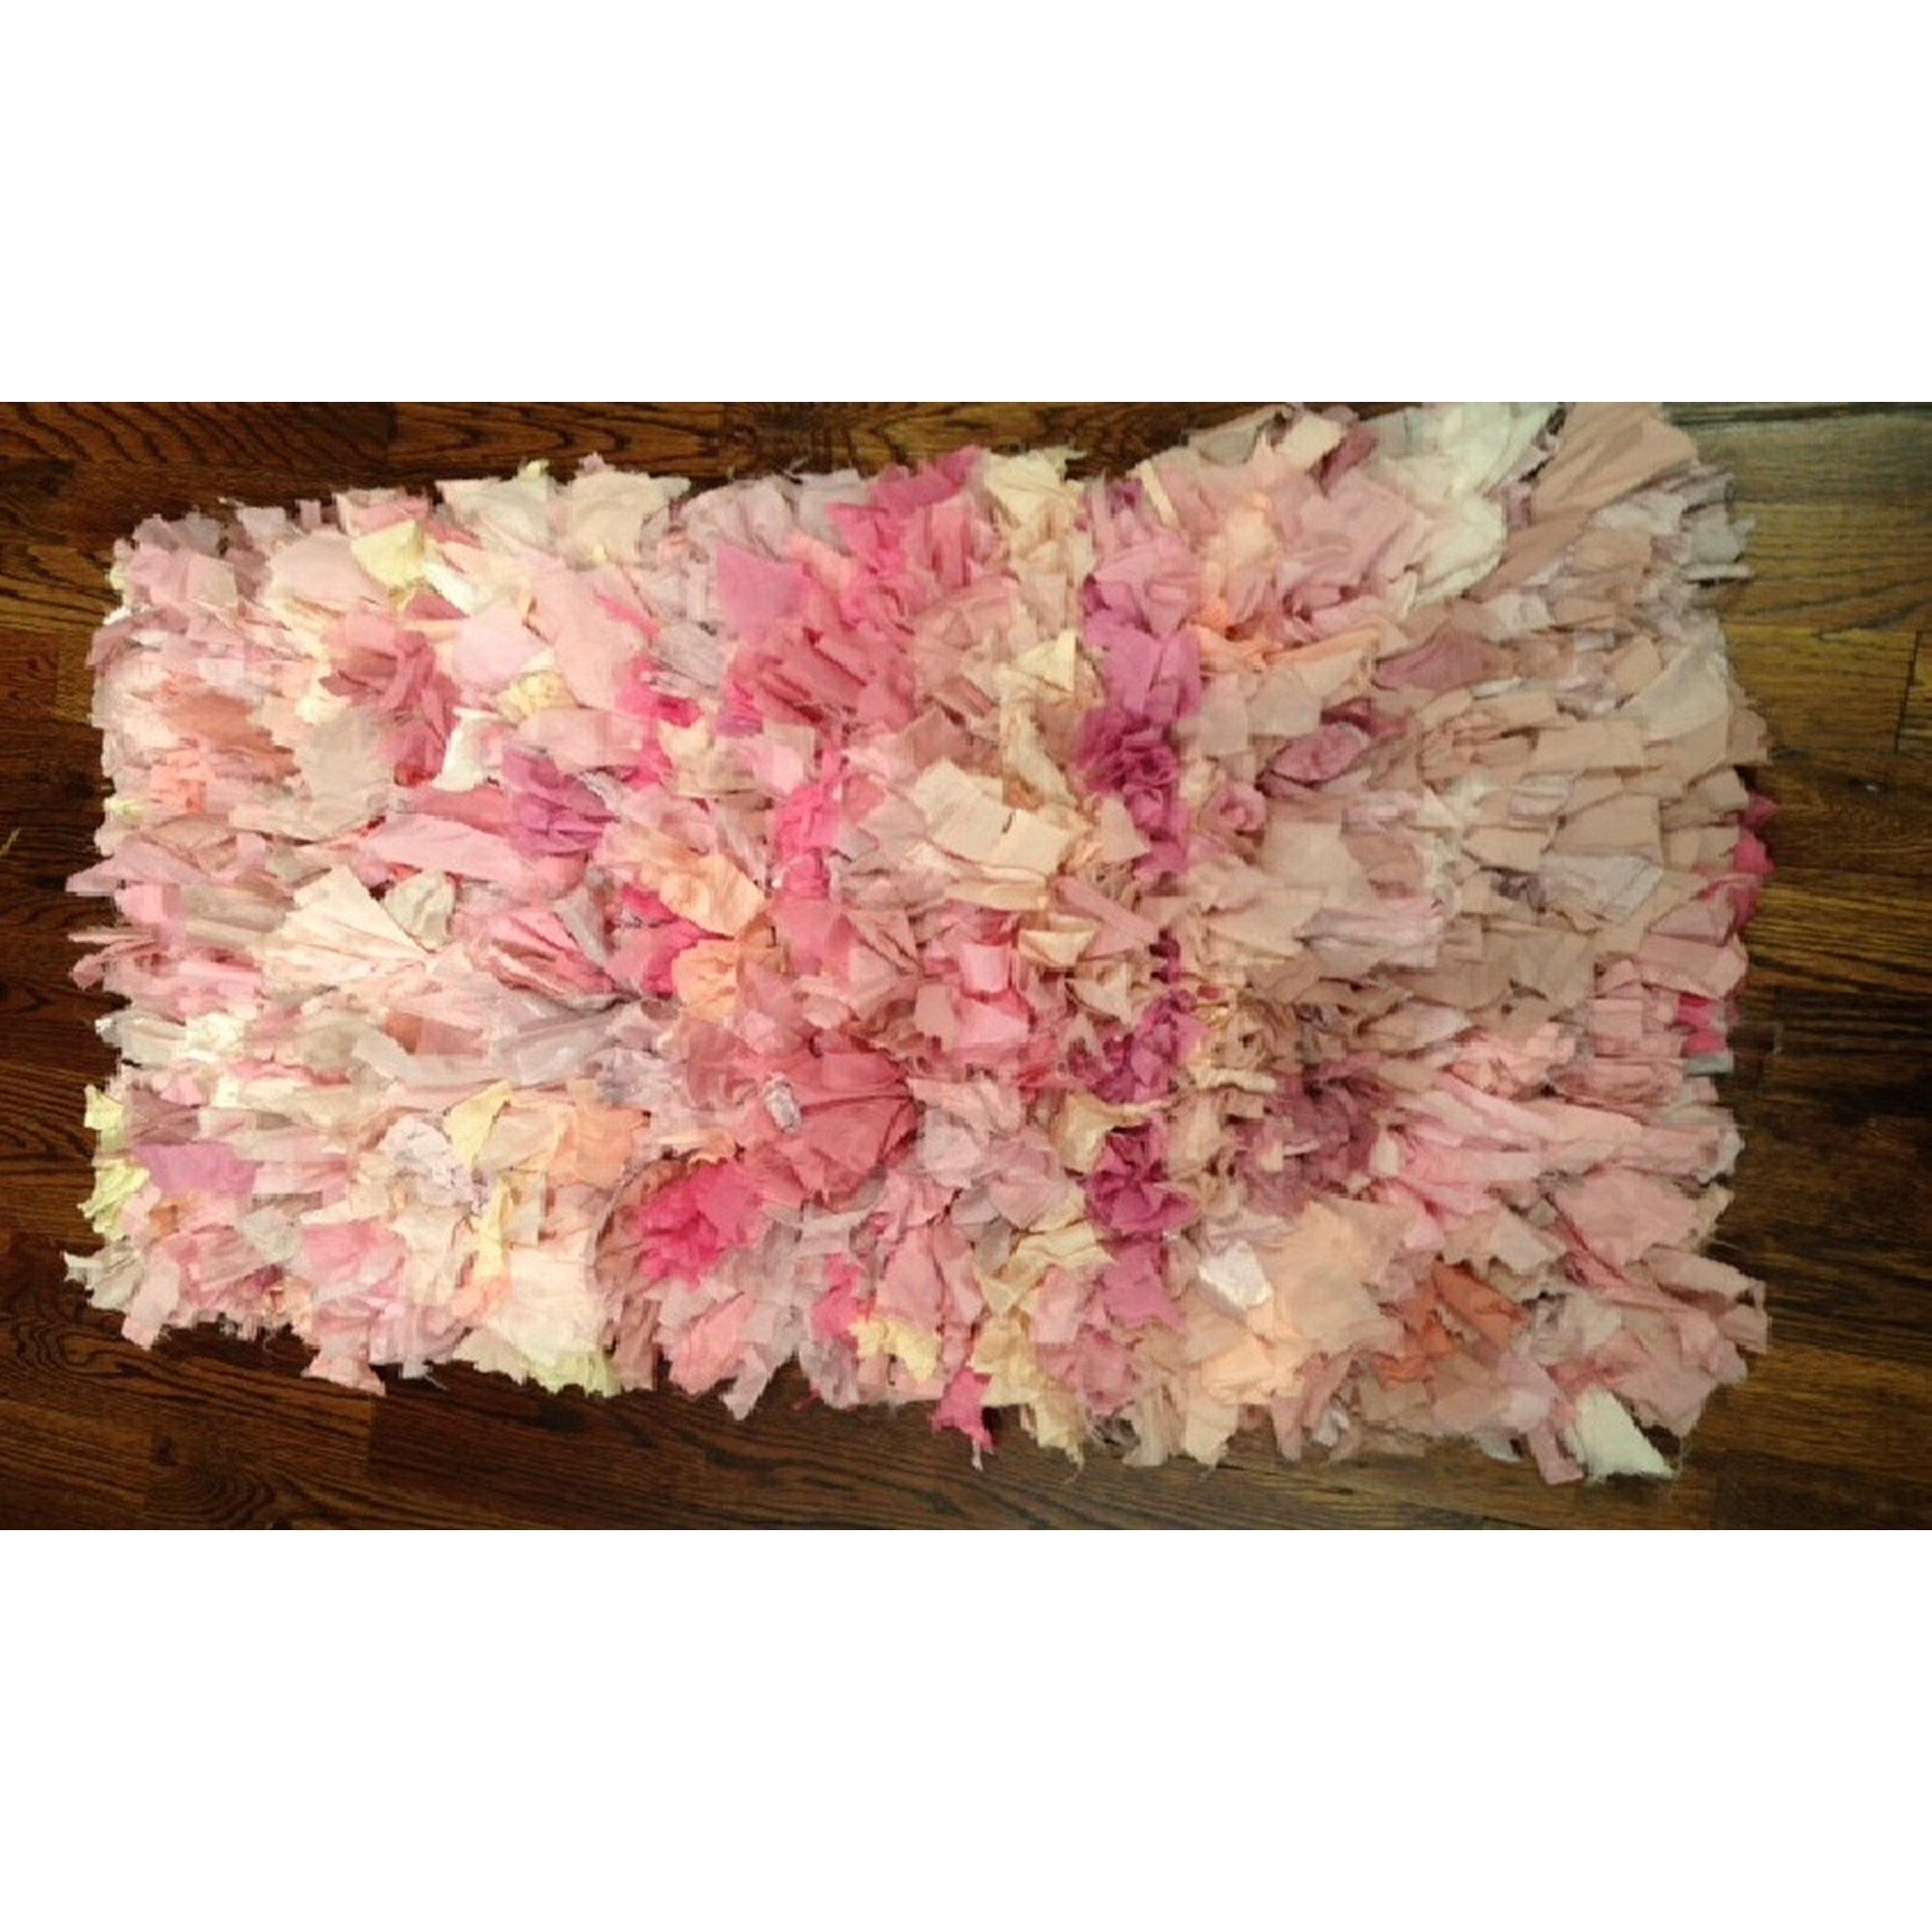 Safavieh Ivory/Pink Shag Area Rug & Reviews